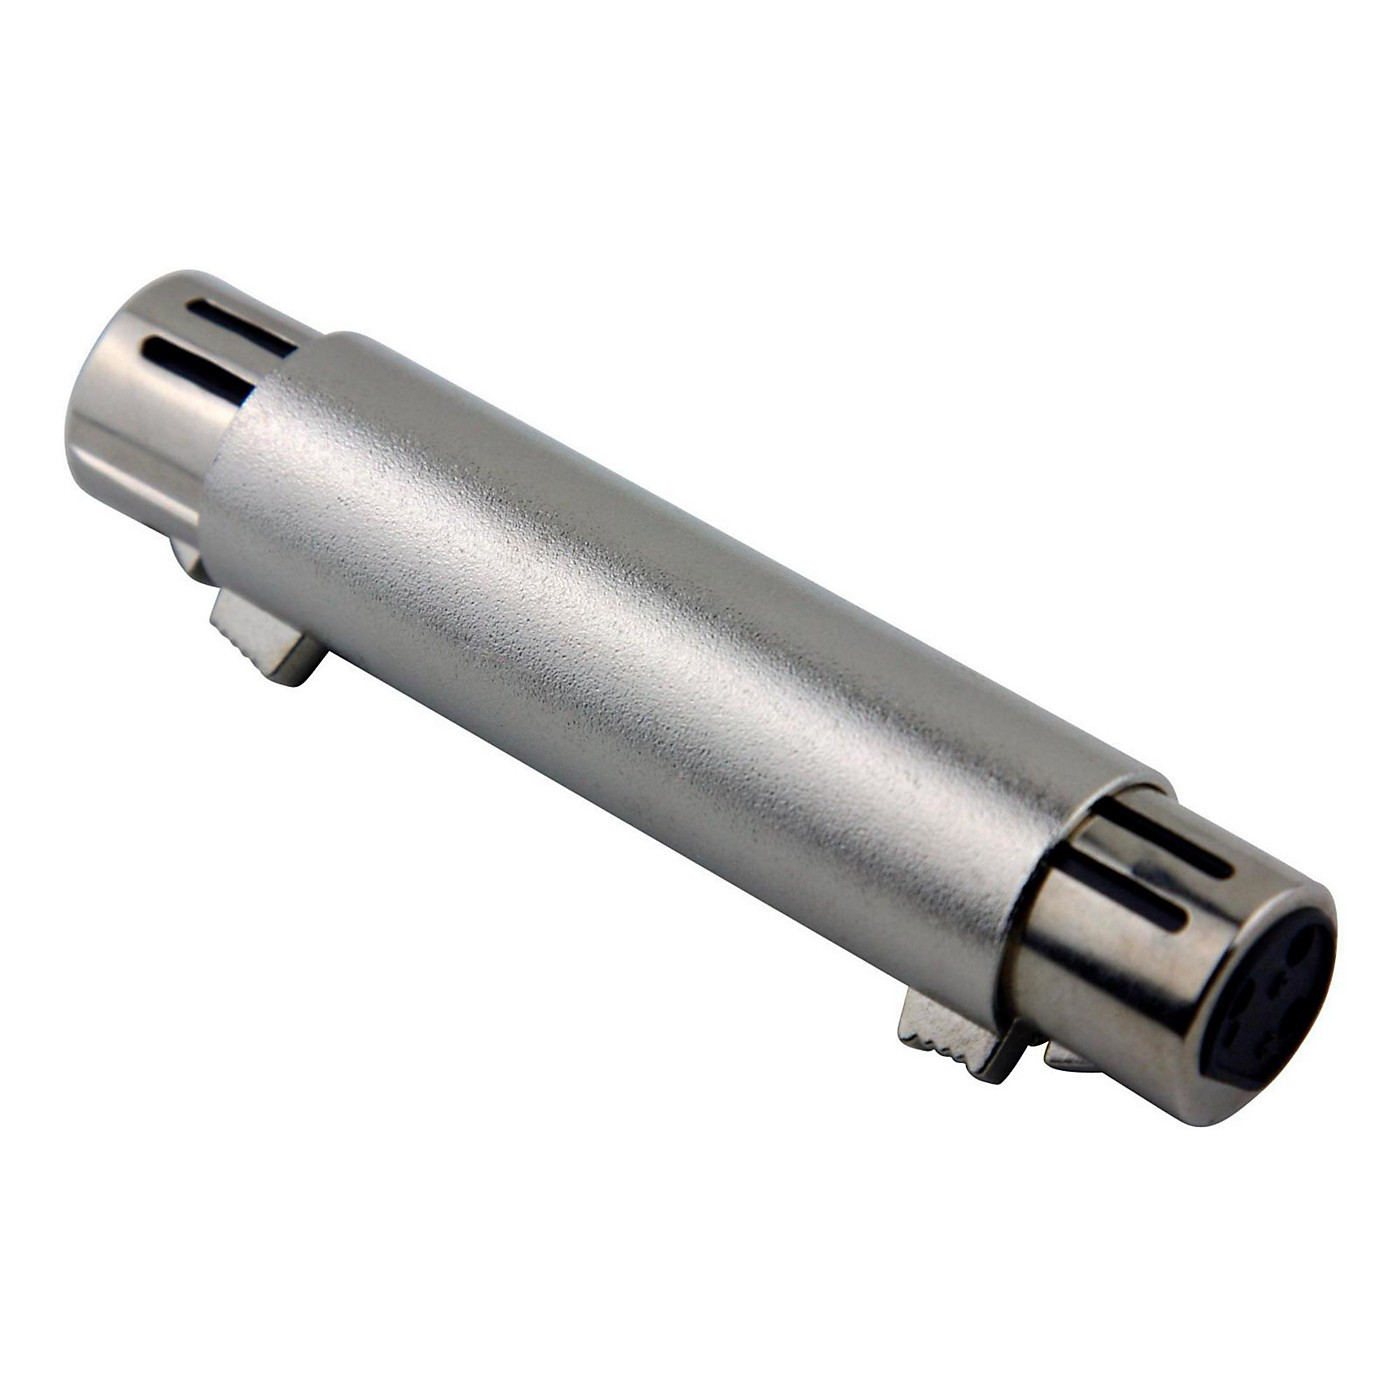 Pig Hog Solutions XLR(F) to XLR(F) Balanced Adapter thumbnail